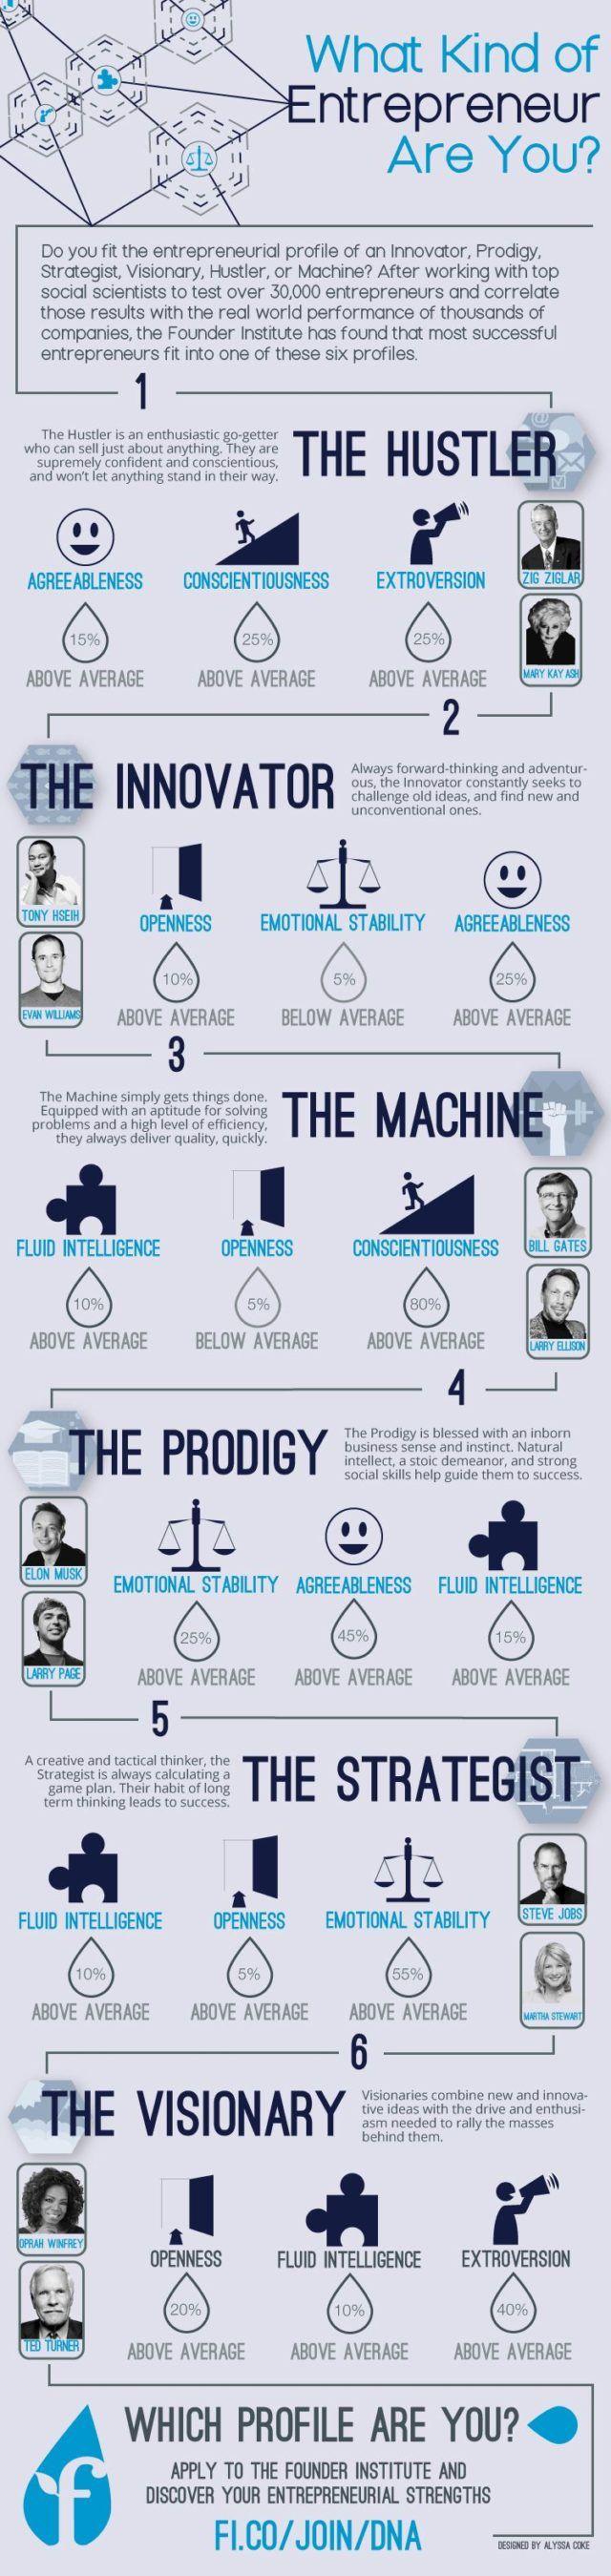 20160513061136-entrepreneur-infographic